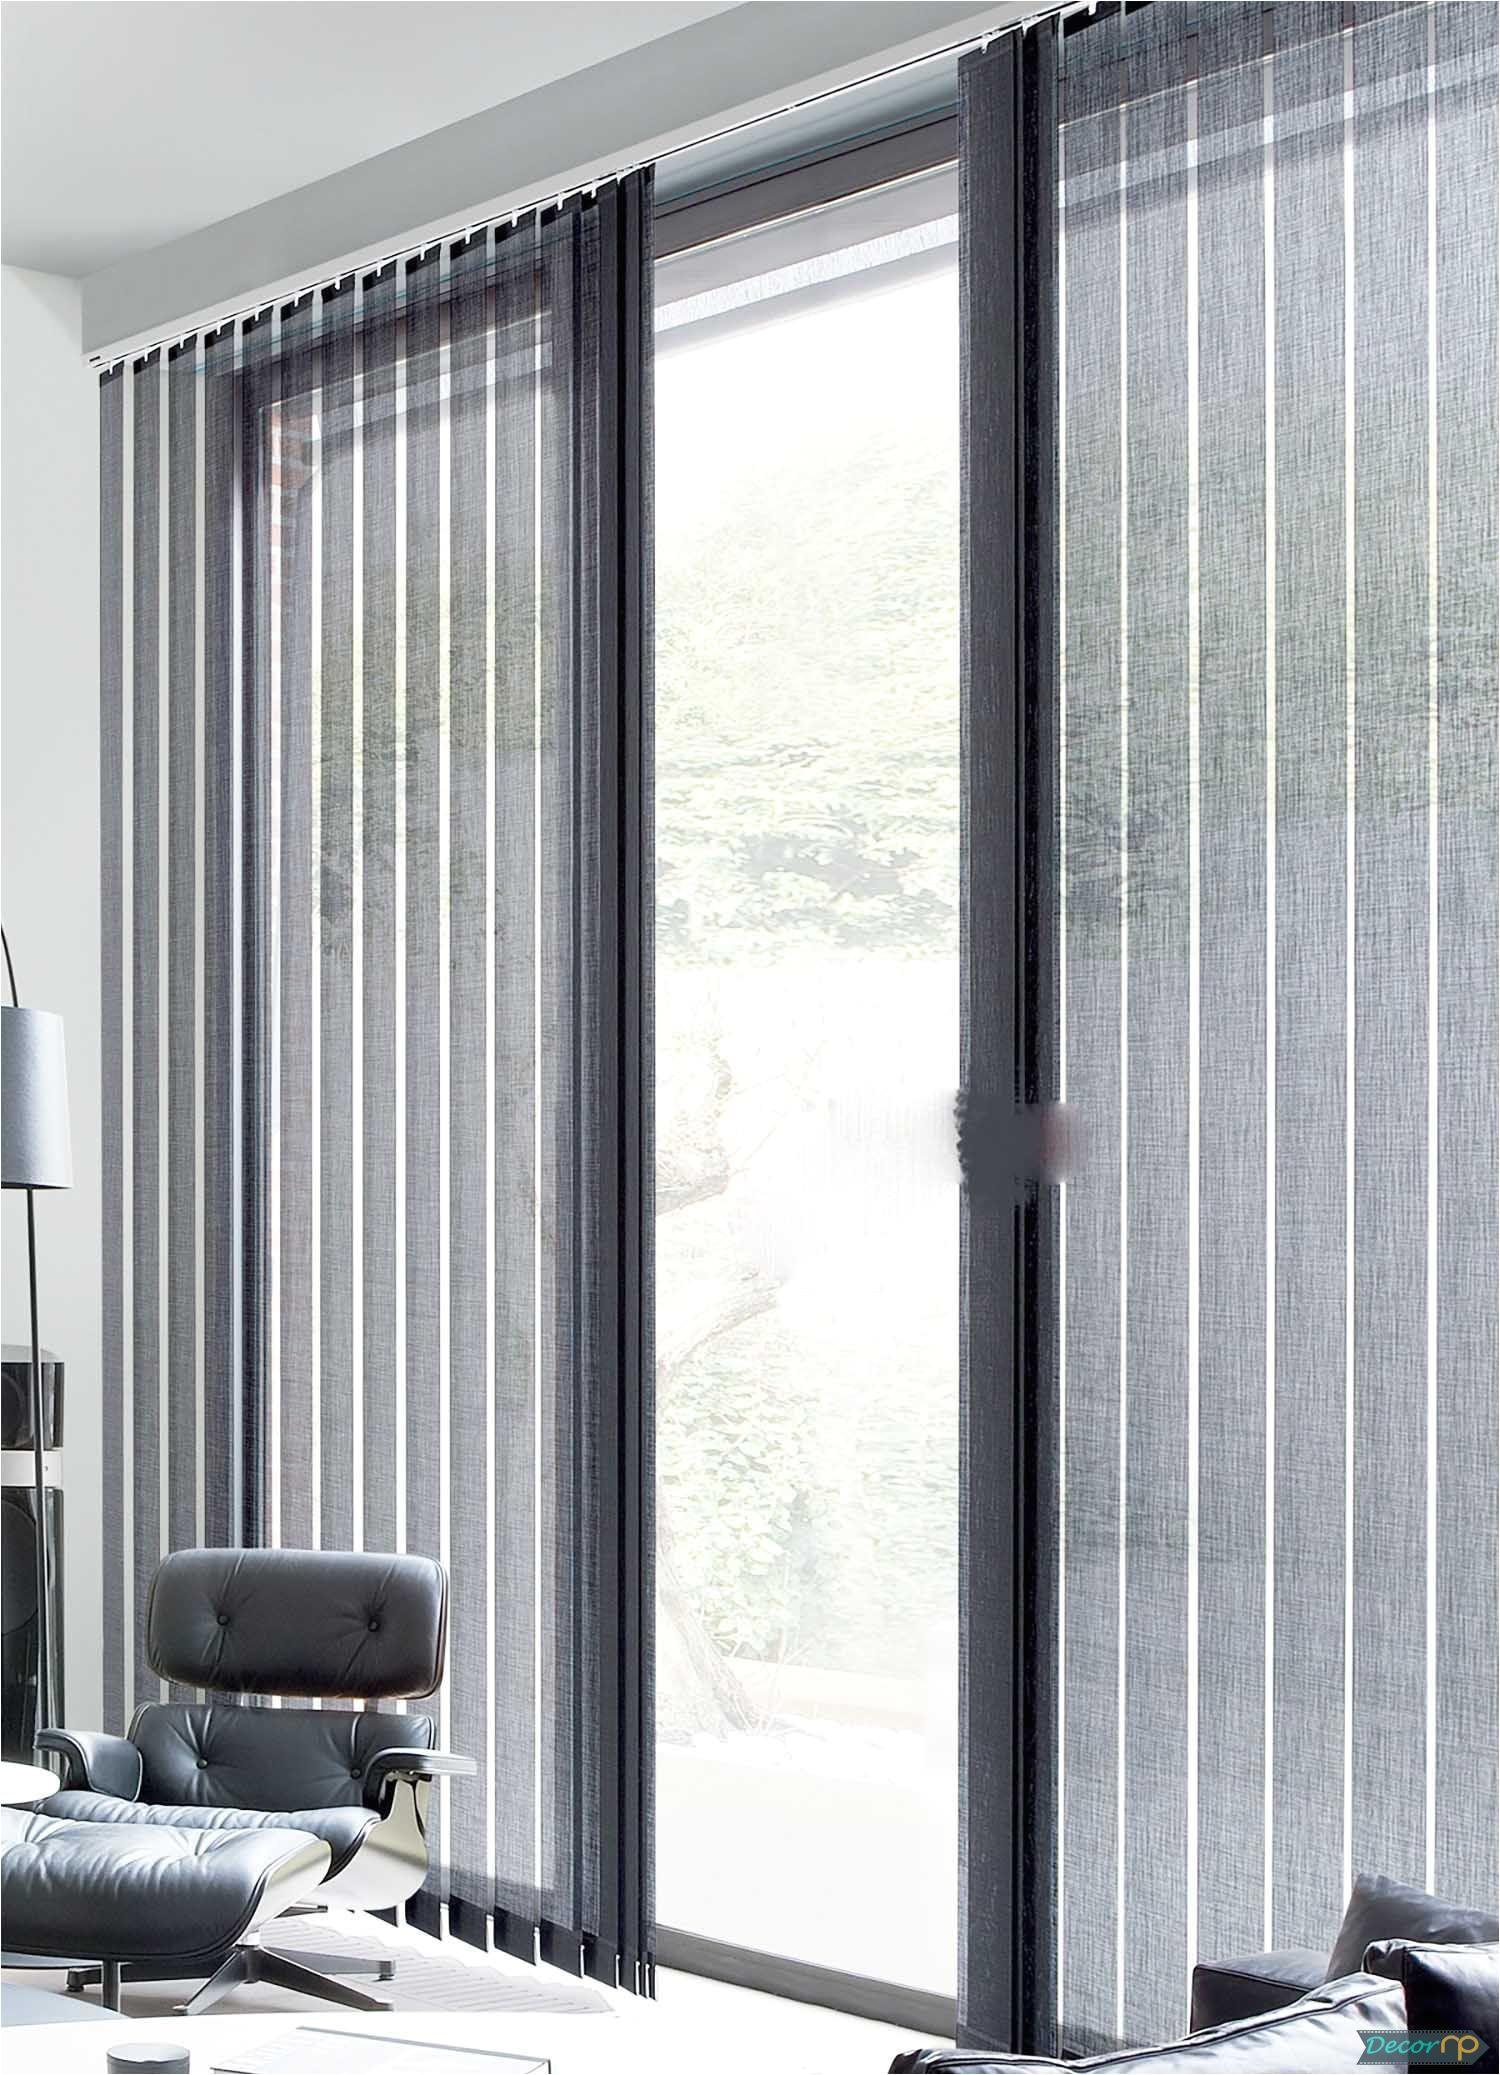 15 vertical modern blinds style in 2018 blinds2018 verticalblindscover verticalblindscolor